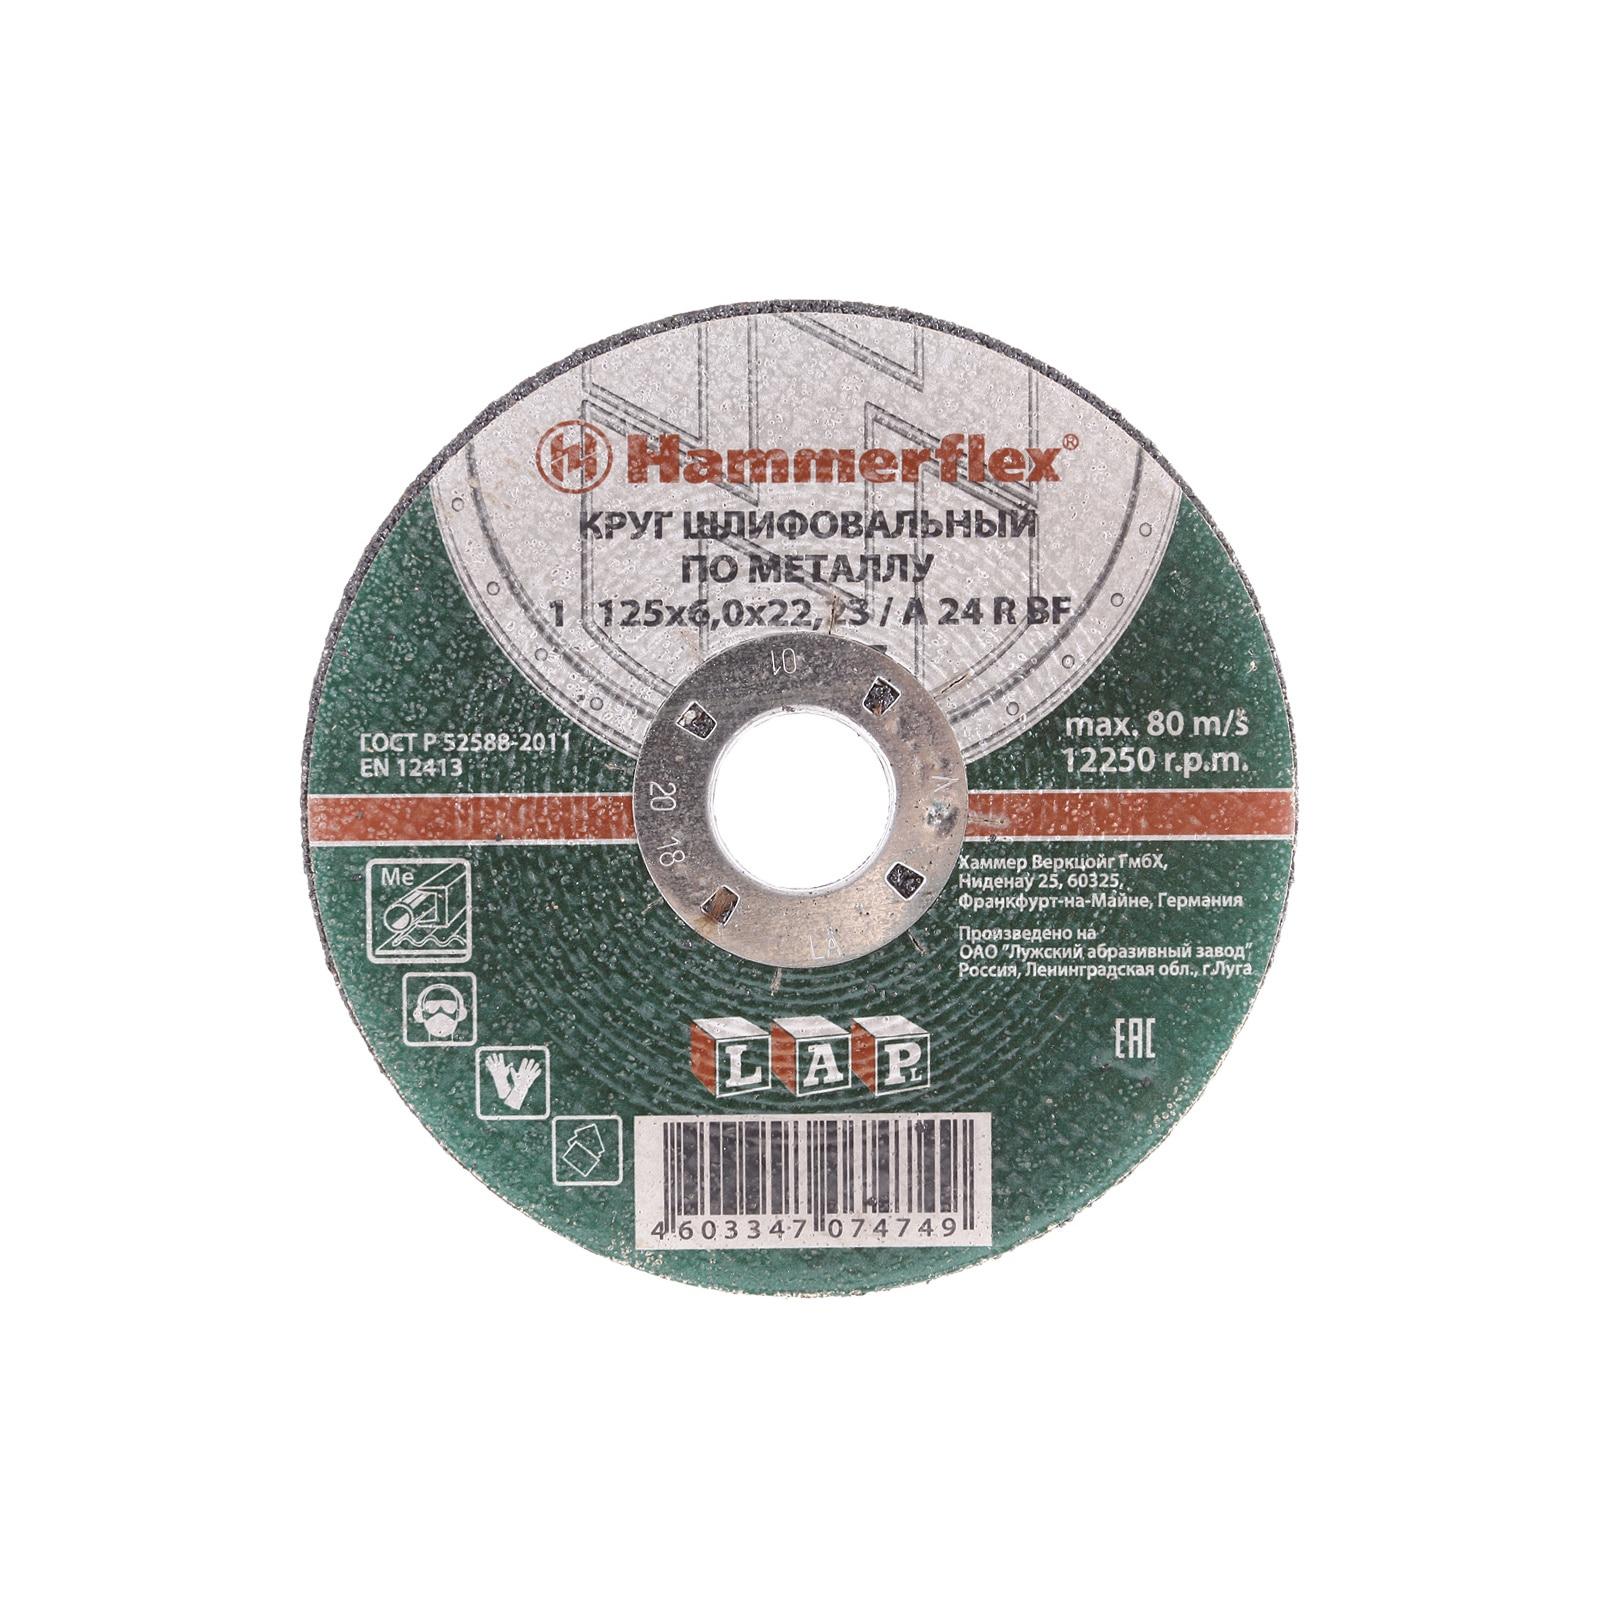 Circle Grinding HAMMER 125х6х22мм 14A Pkg. 10 PCs